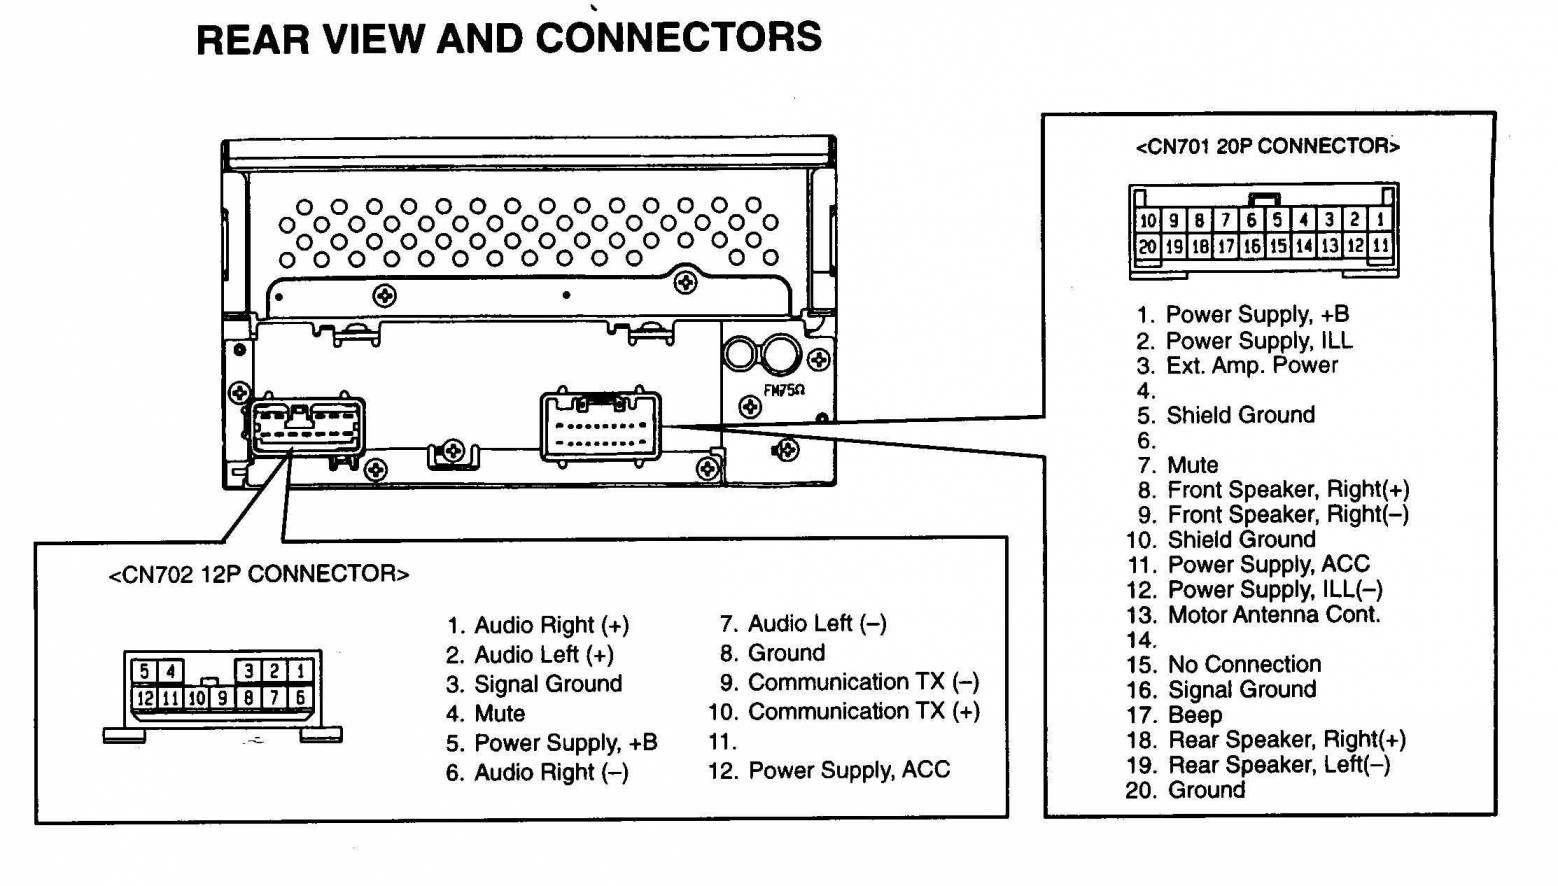 10 Car Amplifier Diagram Wiring Electrical Wiring Diagram Car Stereo Diagram